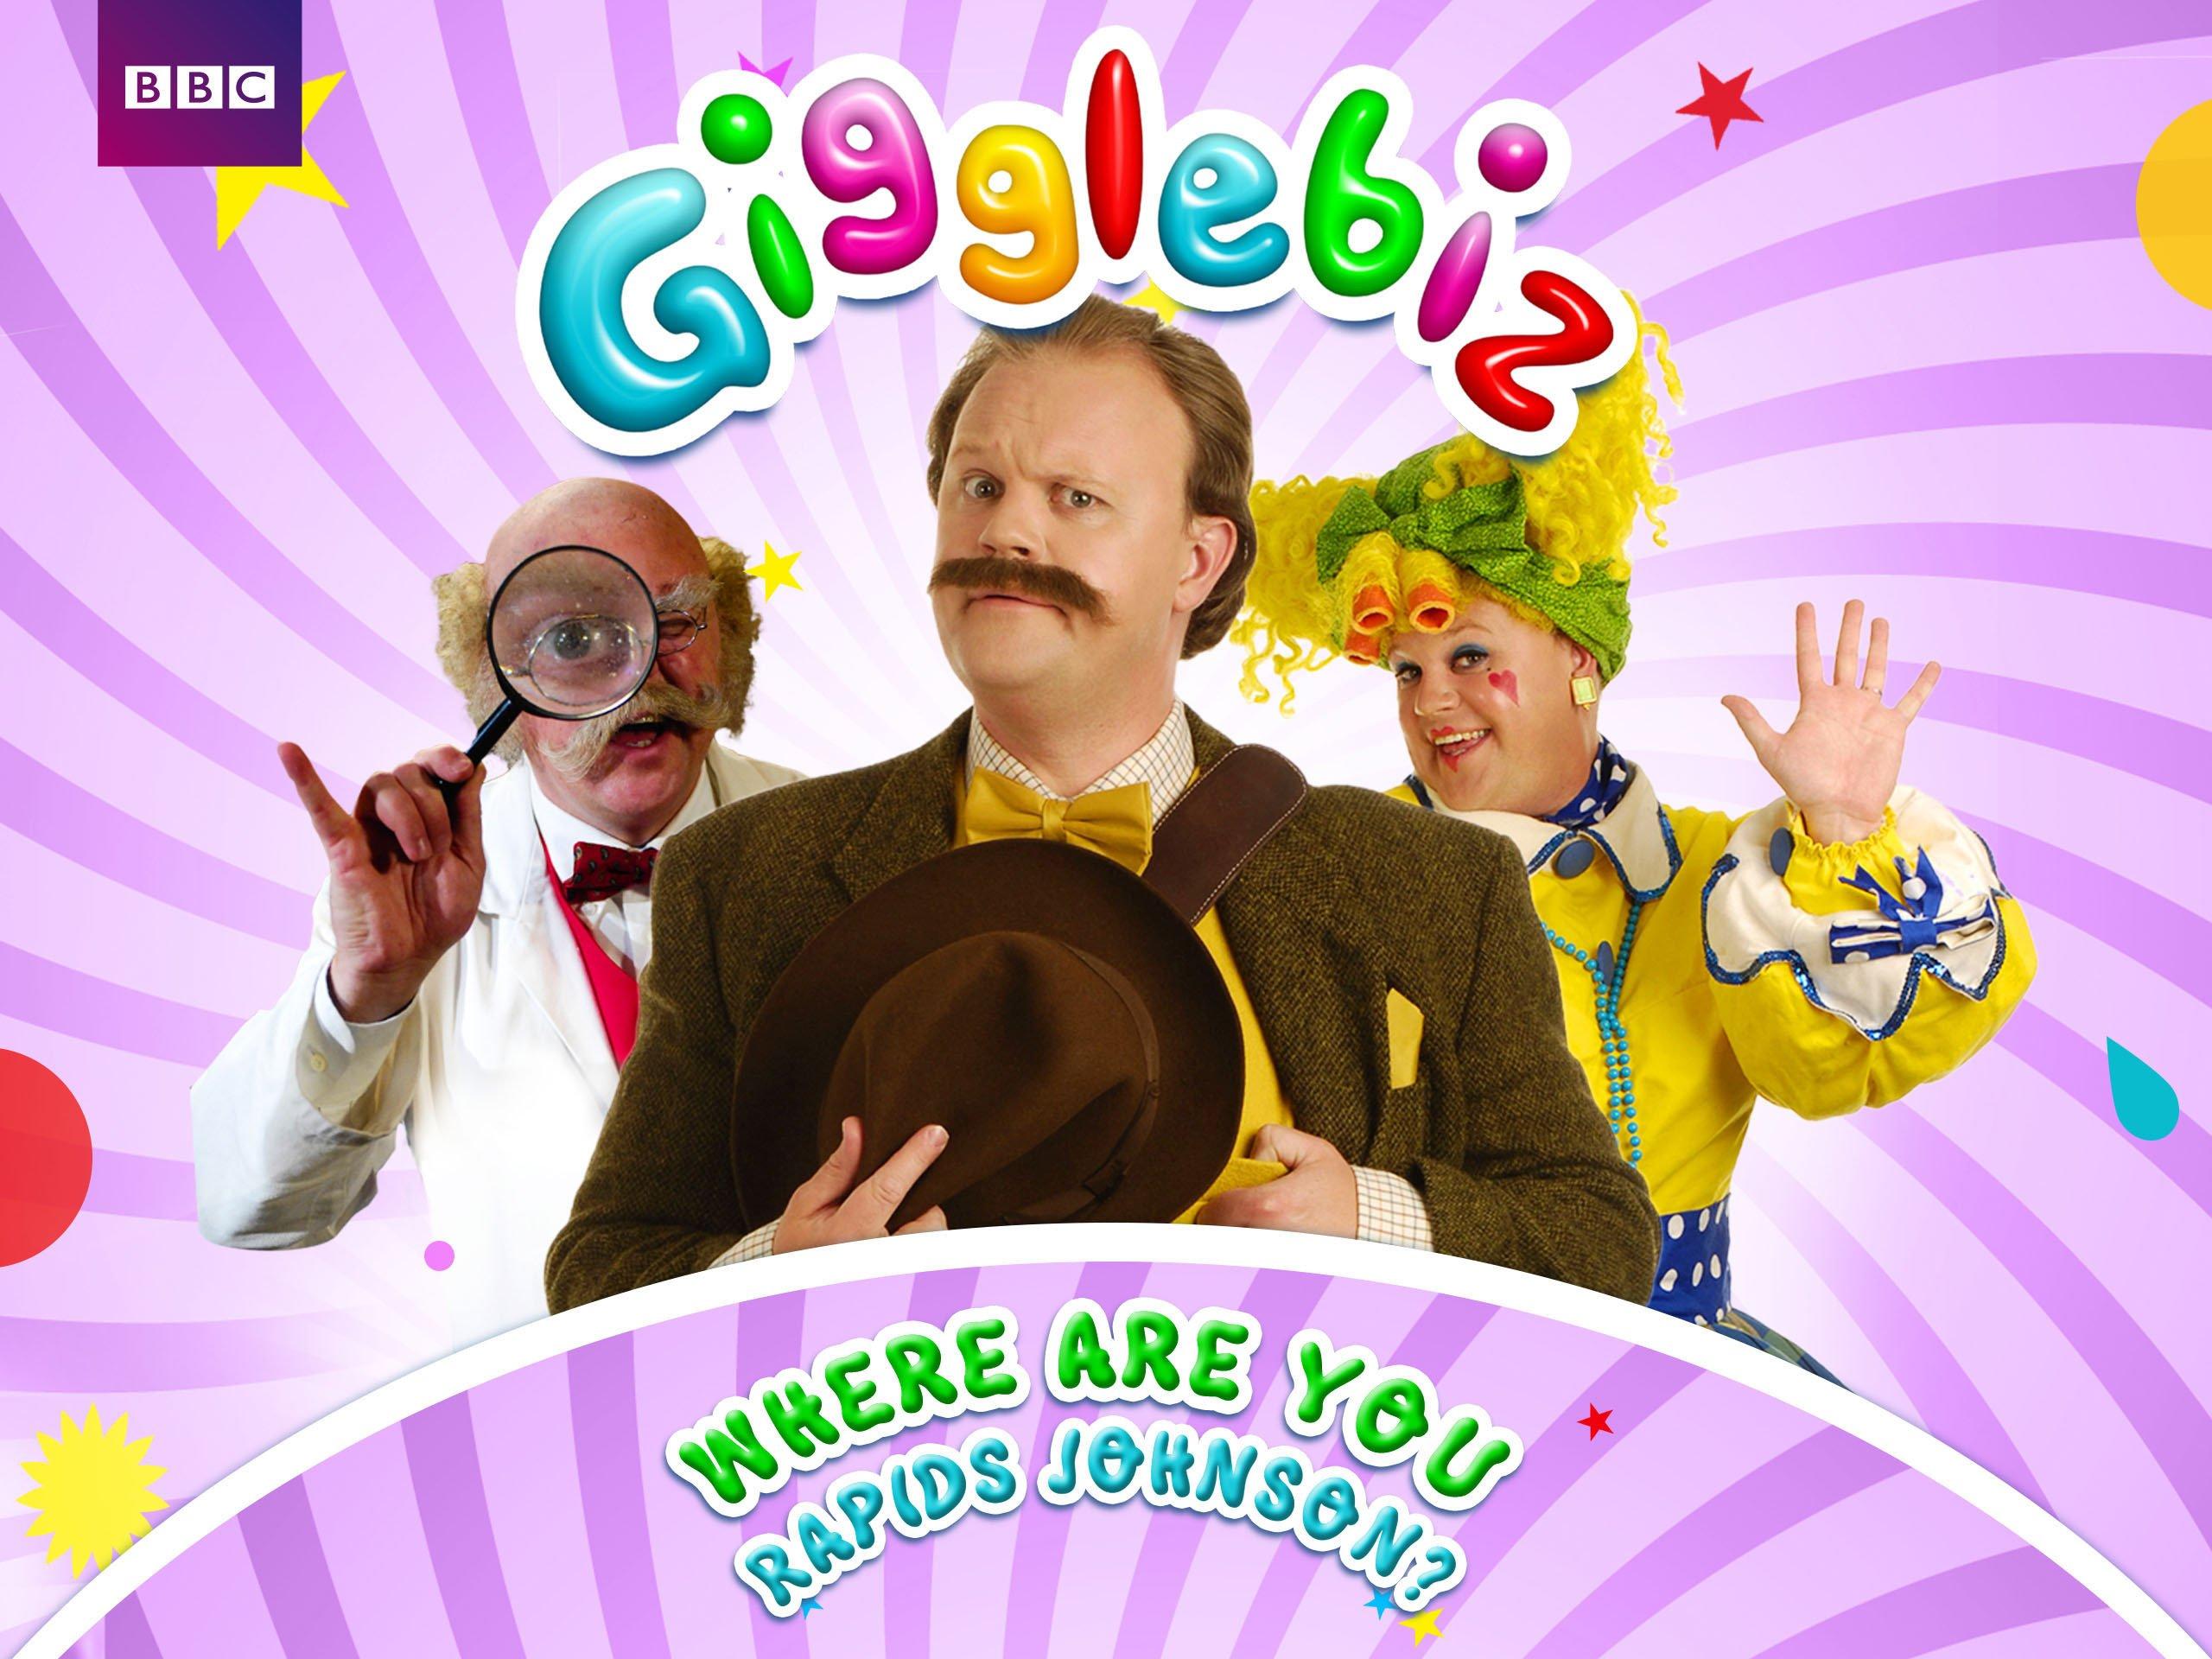 Gigglebiz: Where are you Rapids Johnson? - Season 2